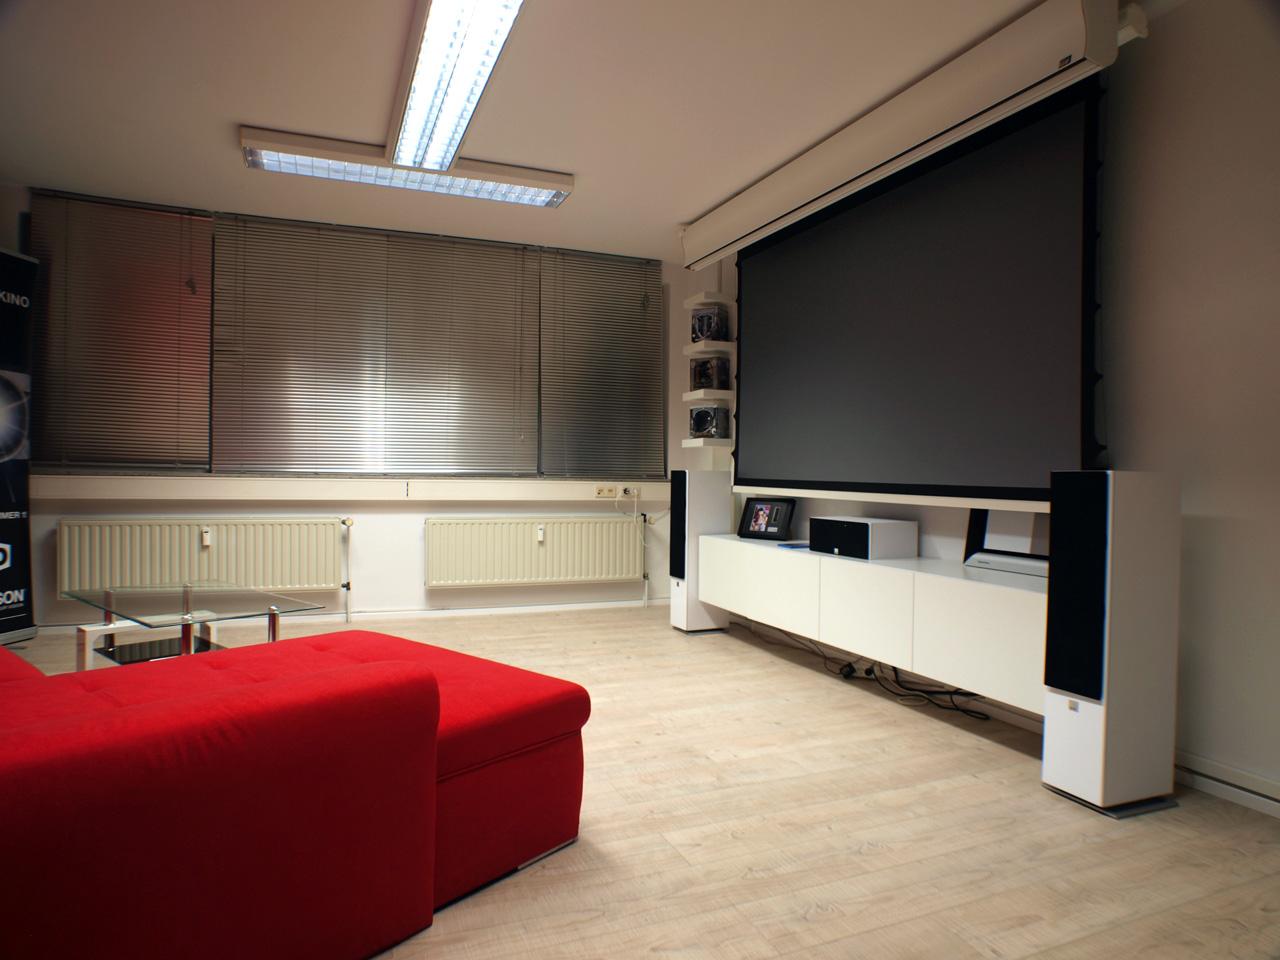 wohnzimmer ideen beamer. Black Bedroom Furniture Sets. Home Design Ideas